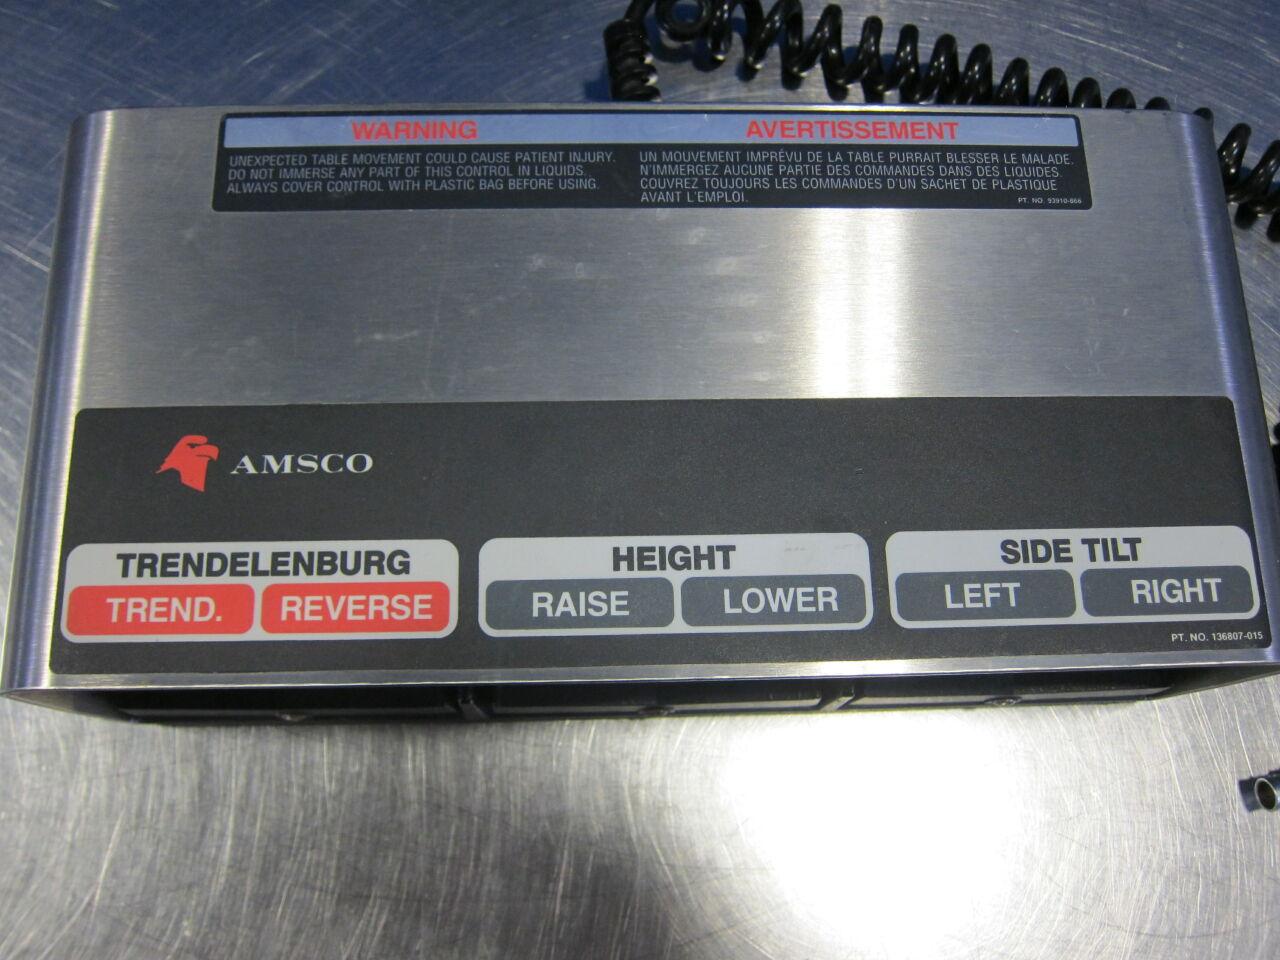 AMSCO 3 Way Foot Pedal